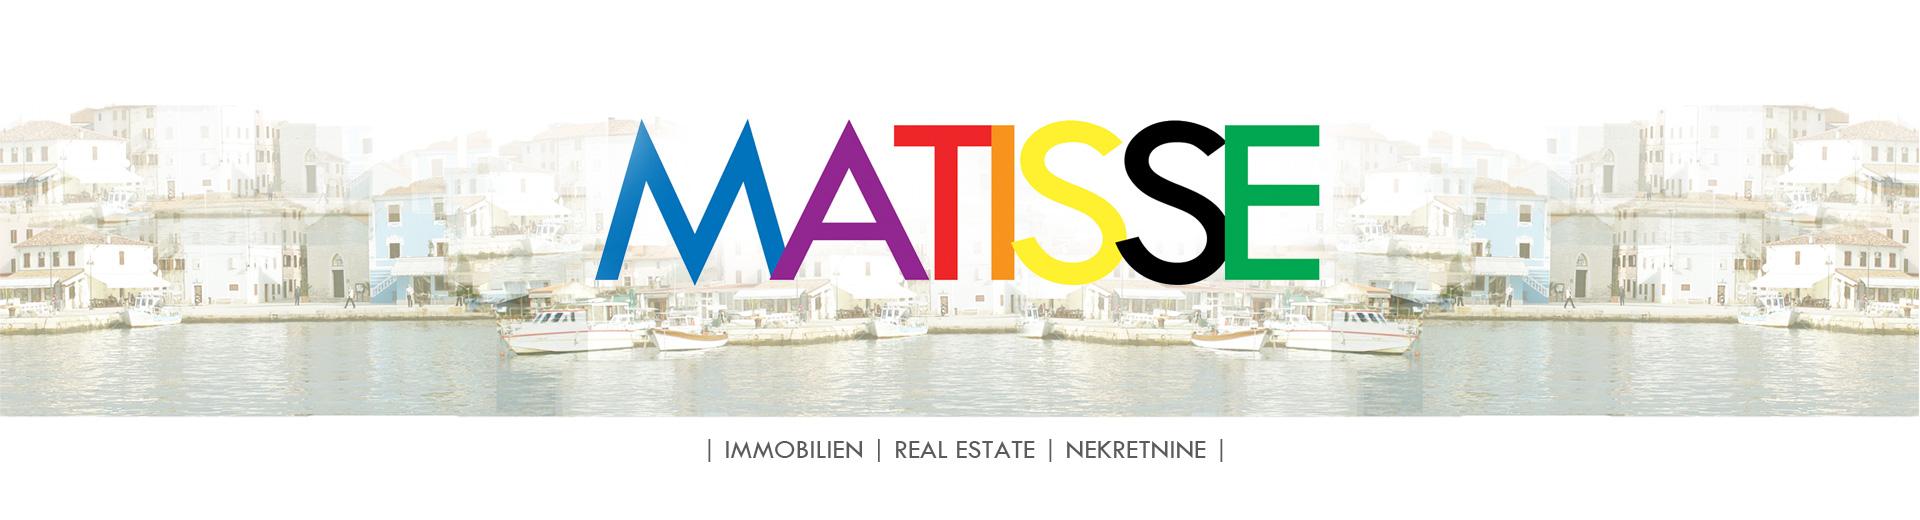 Matisse Immobilie